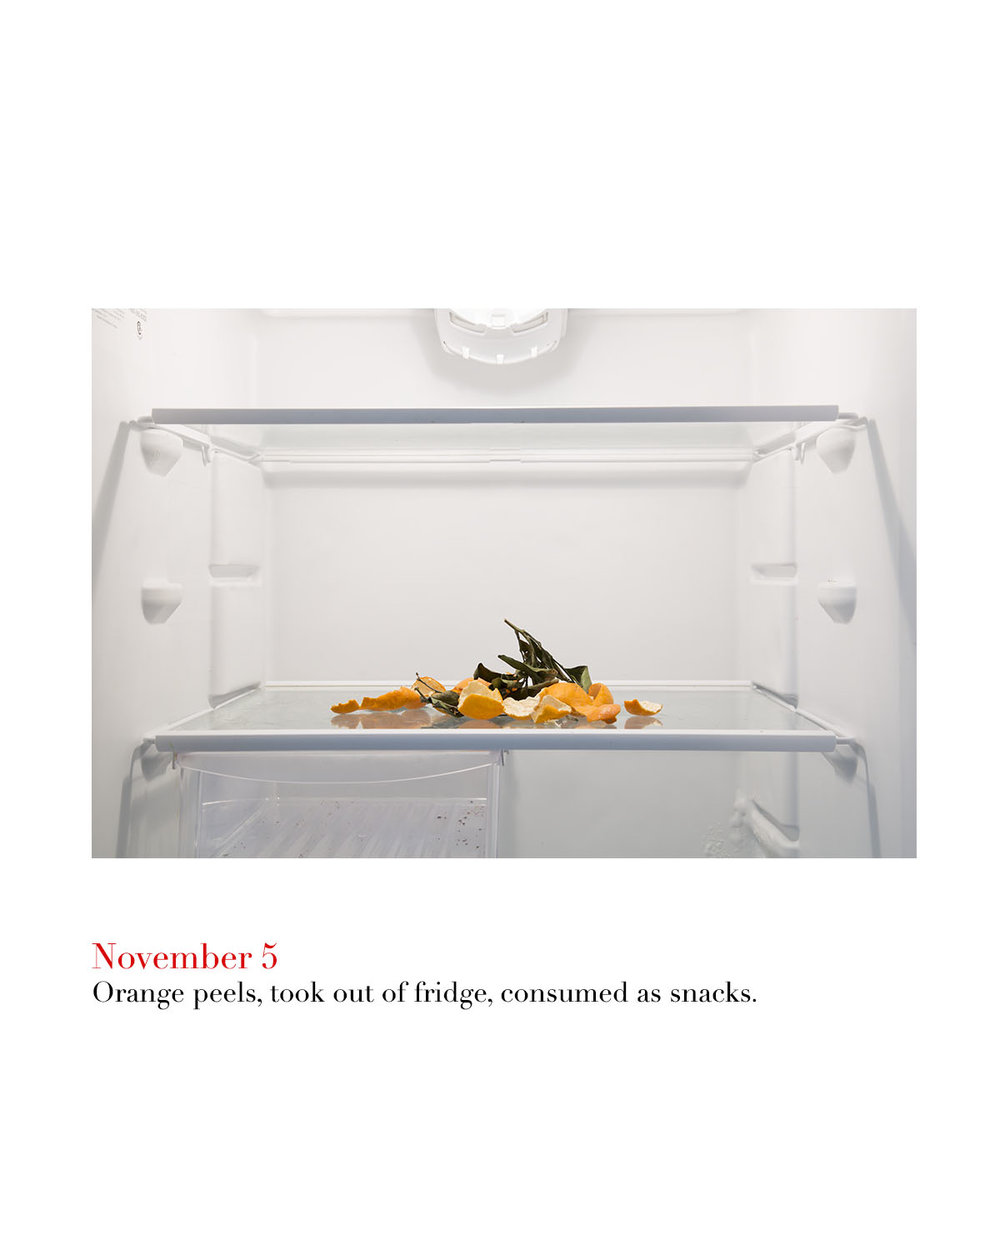 Nov 5 oranges copy.jpg